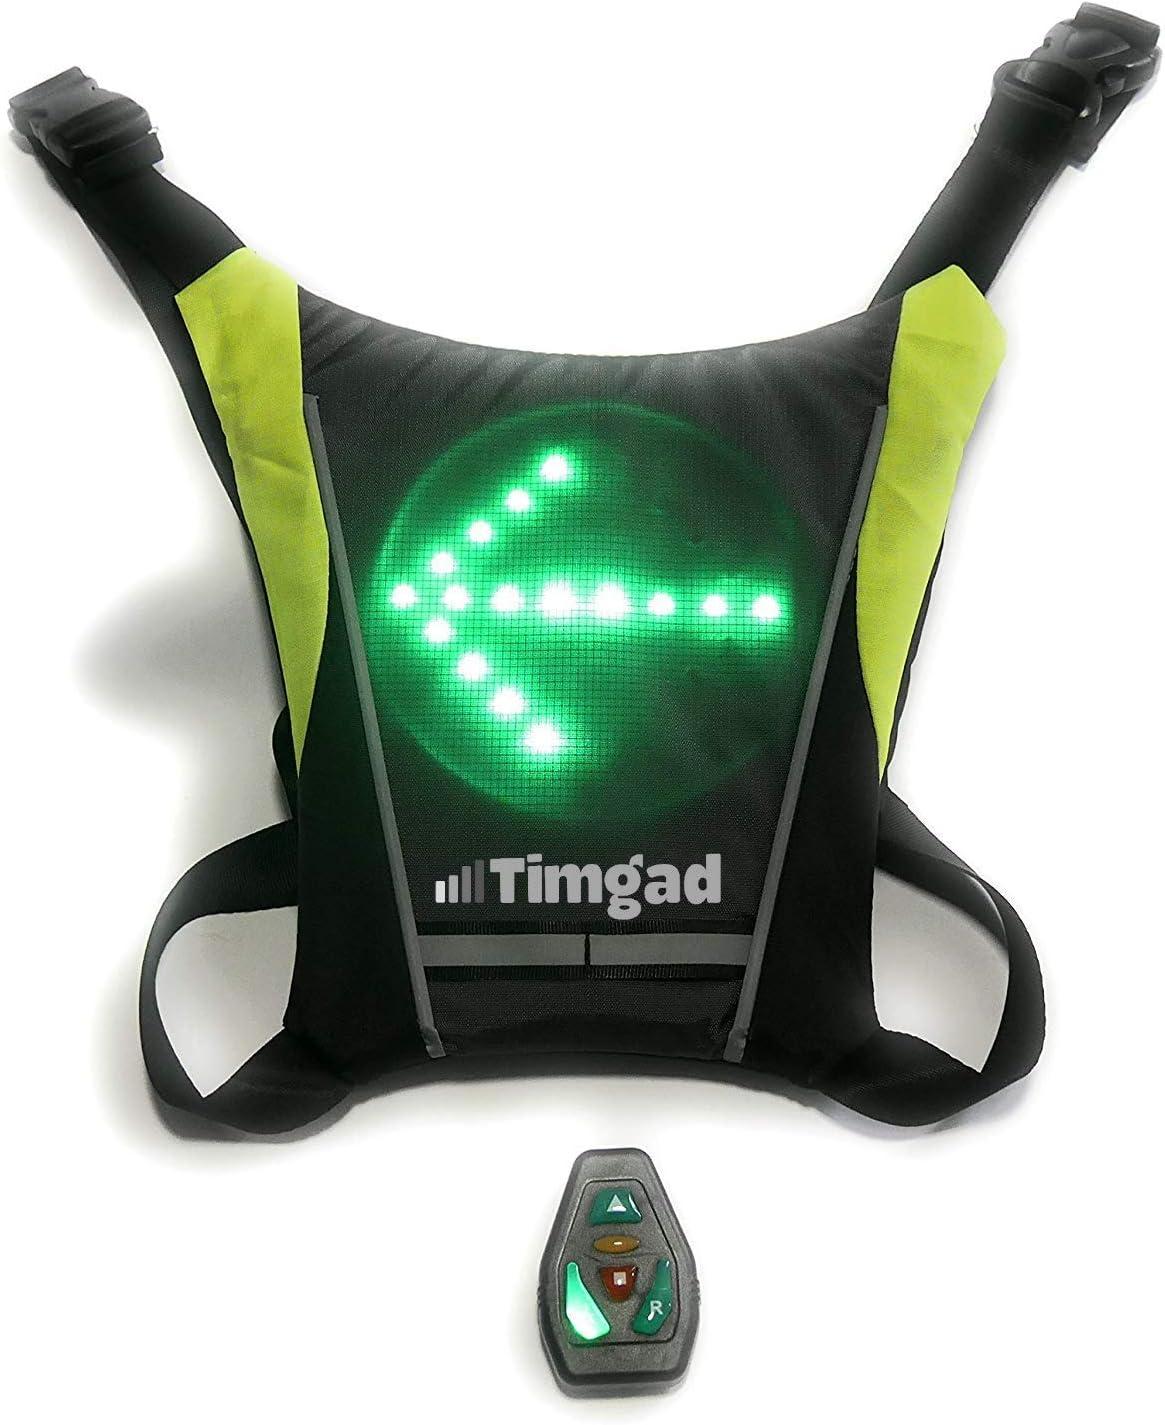 Timgad Chaleco Intermitente LED de Seguridad Reflectante Muy Luminoso para Bicicleta, Patinete eléctrico, Dos Ruedas, hoverboarding, Correr, Running, Patinar, Patinar, Correr, Caminar